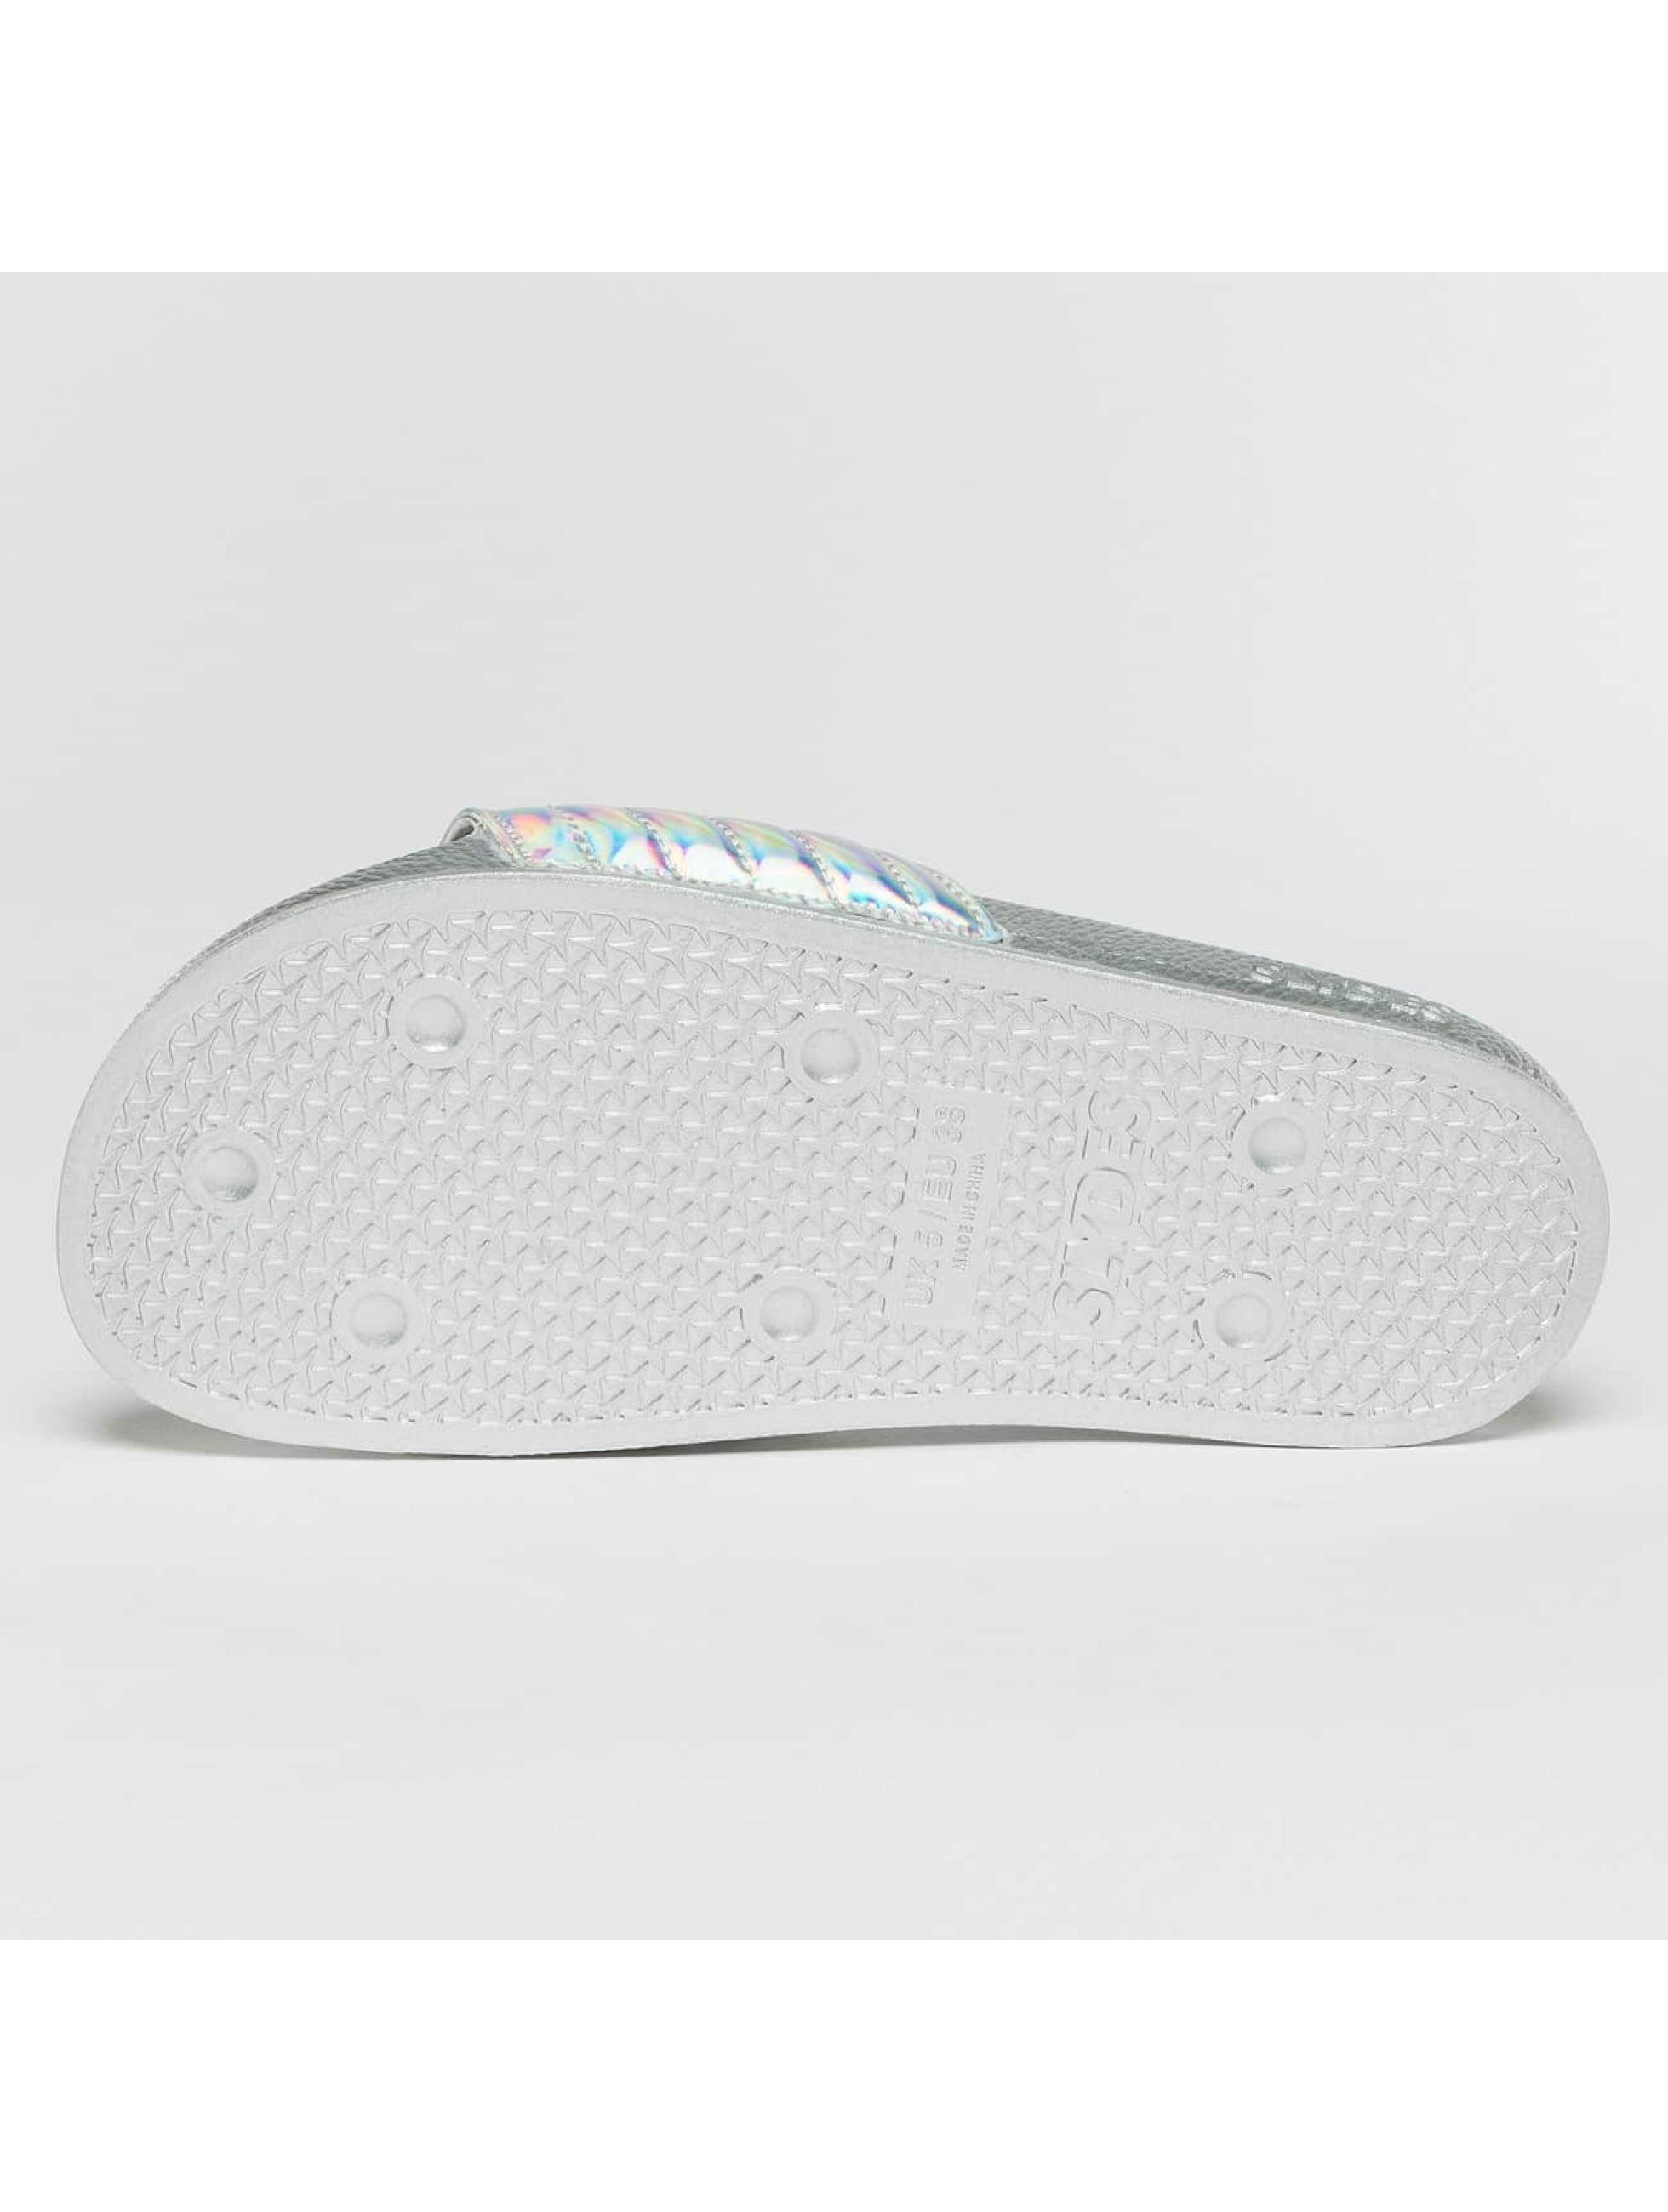 Slydes Sandals Port silver colored